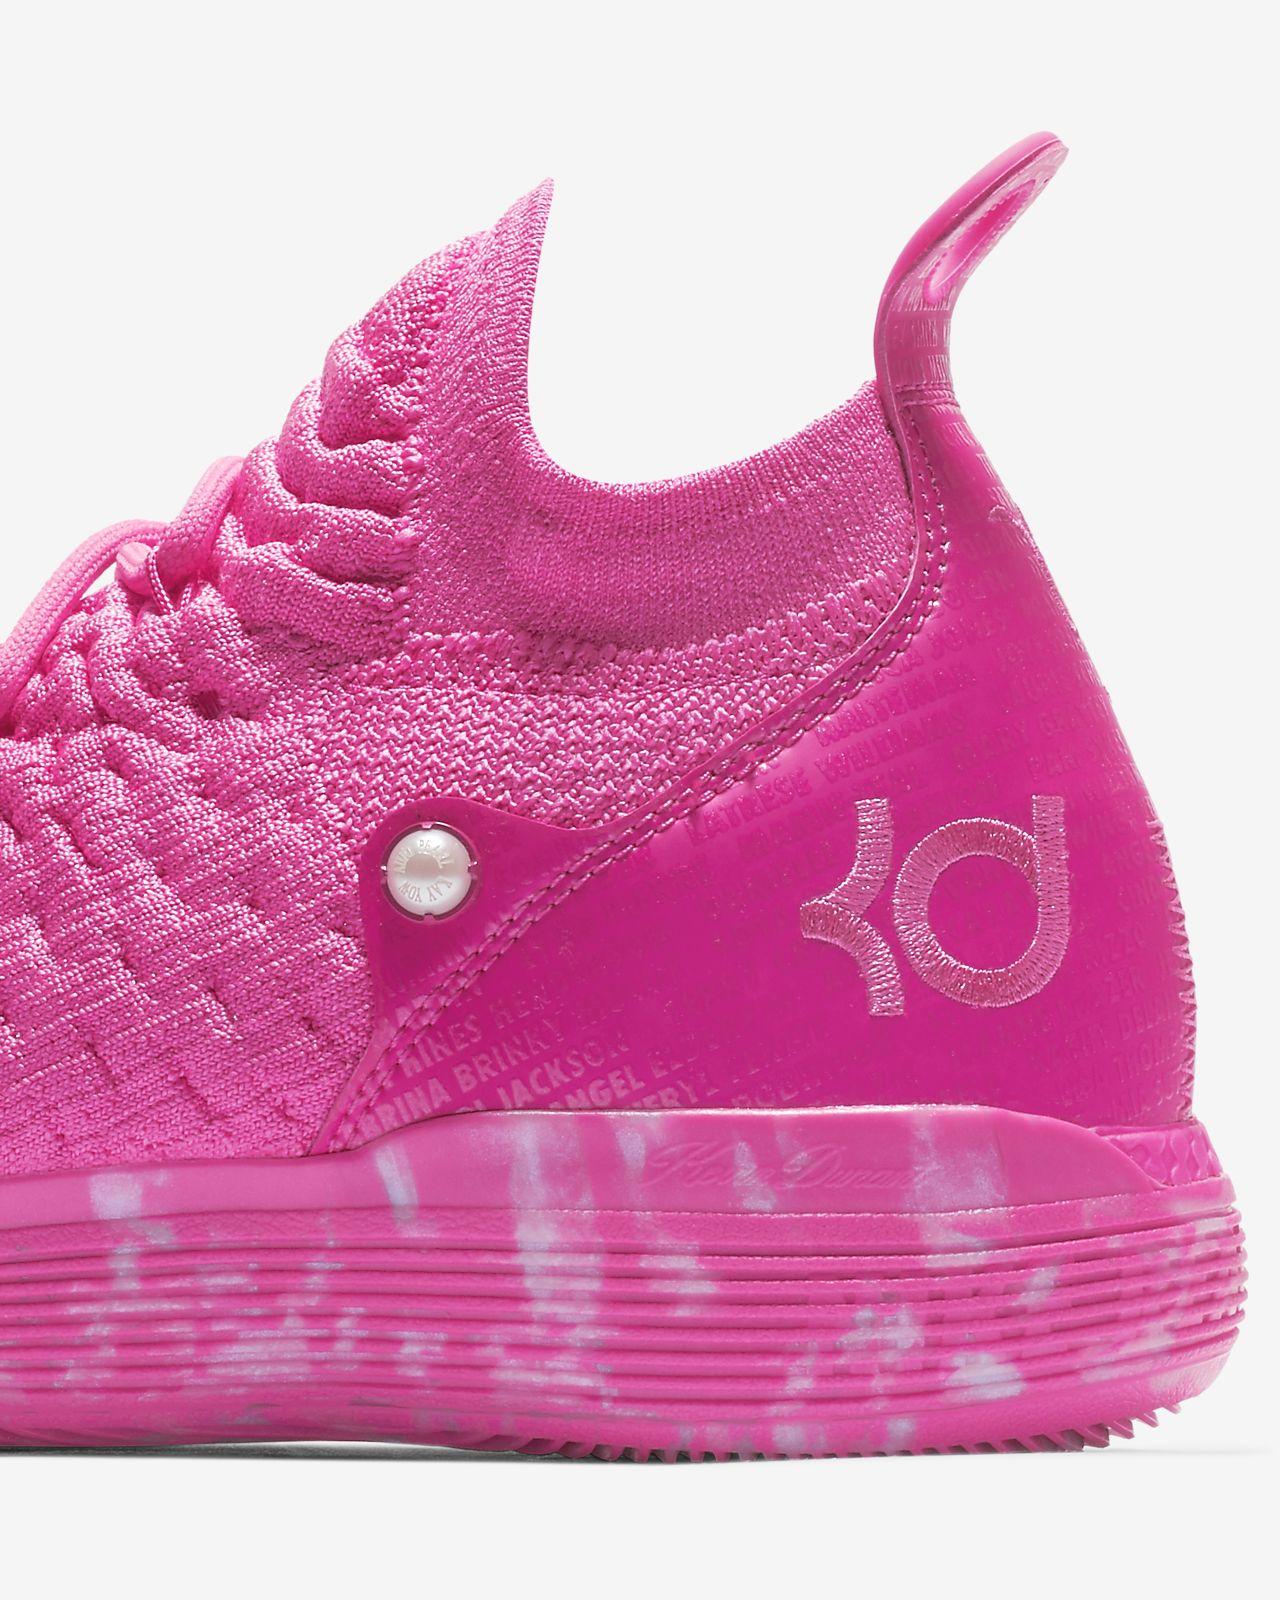 aaf4b901d76 Nike Zoom KD11 Aunt Pearl Basketball Shoe. Nike.com ID